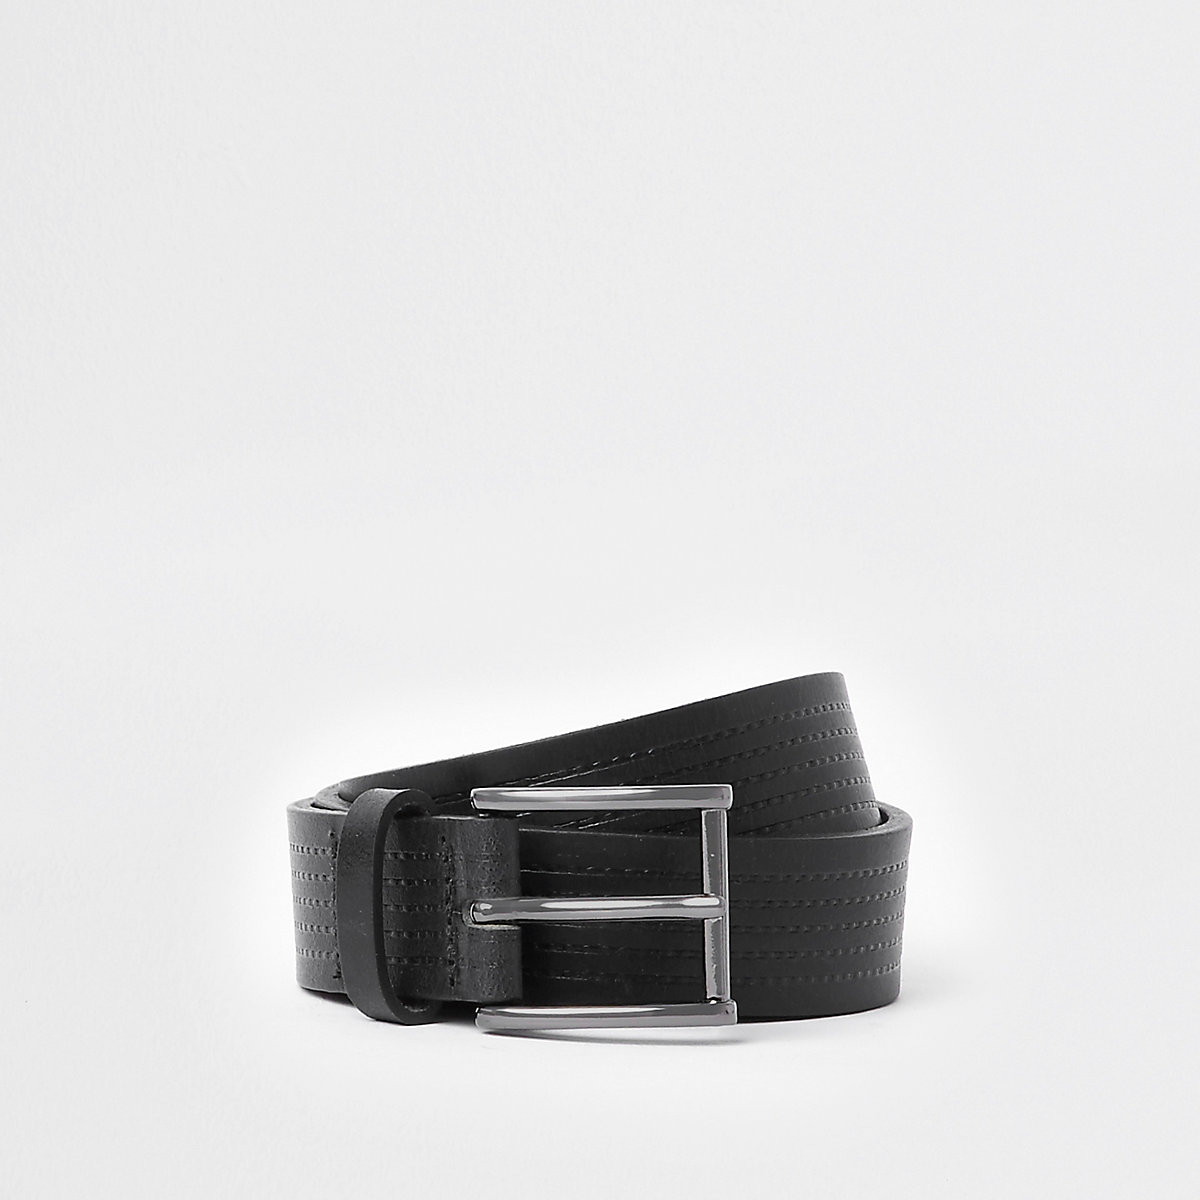 Black stitch leather buckle belt